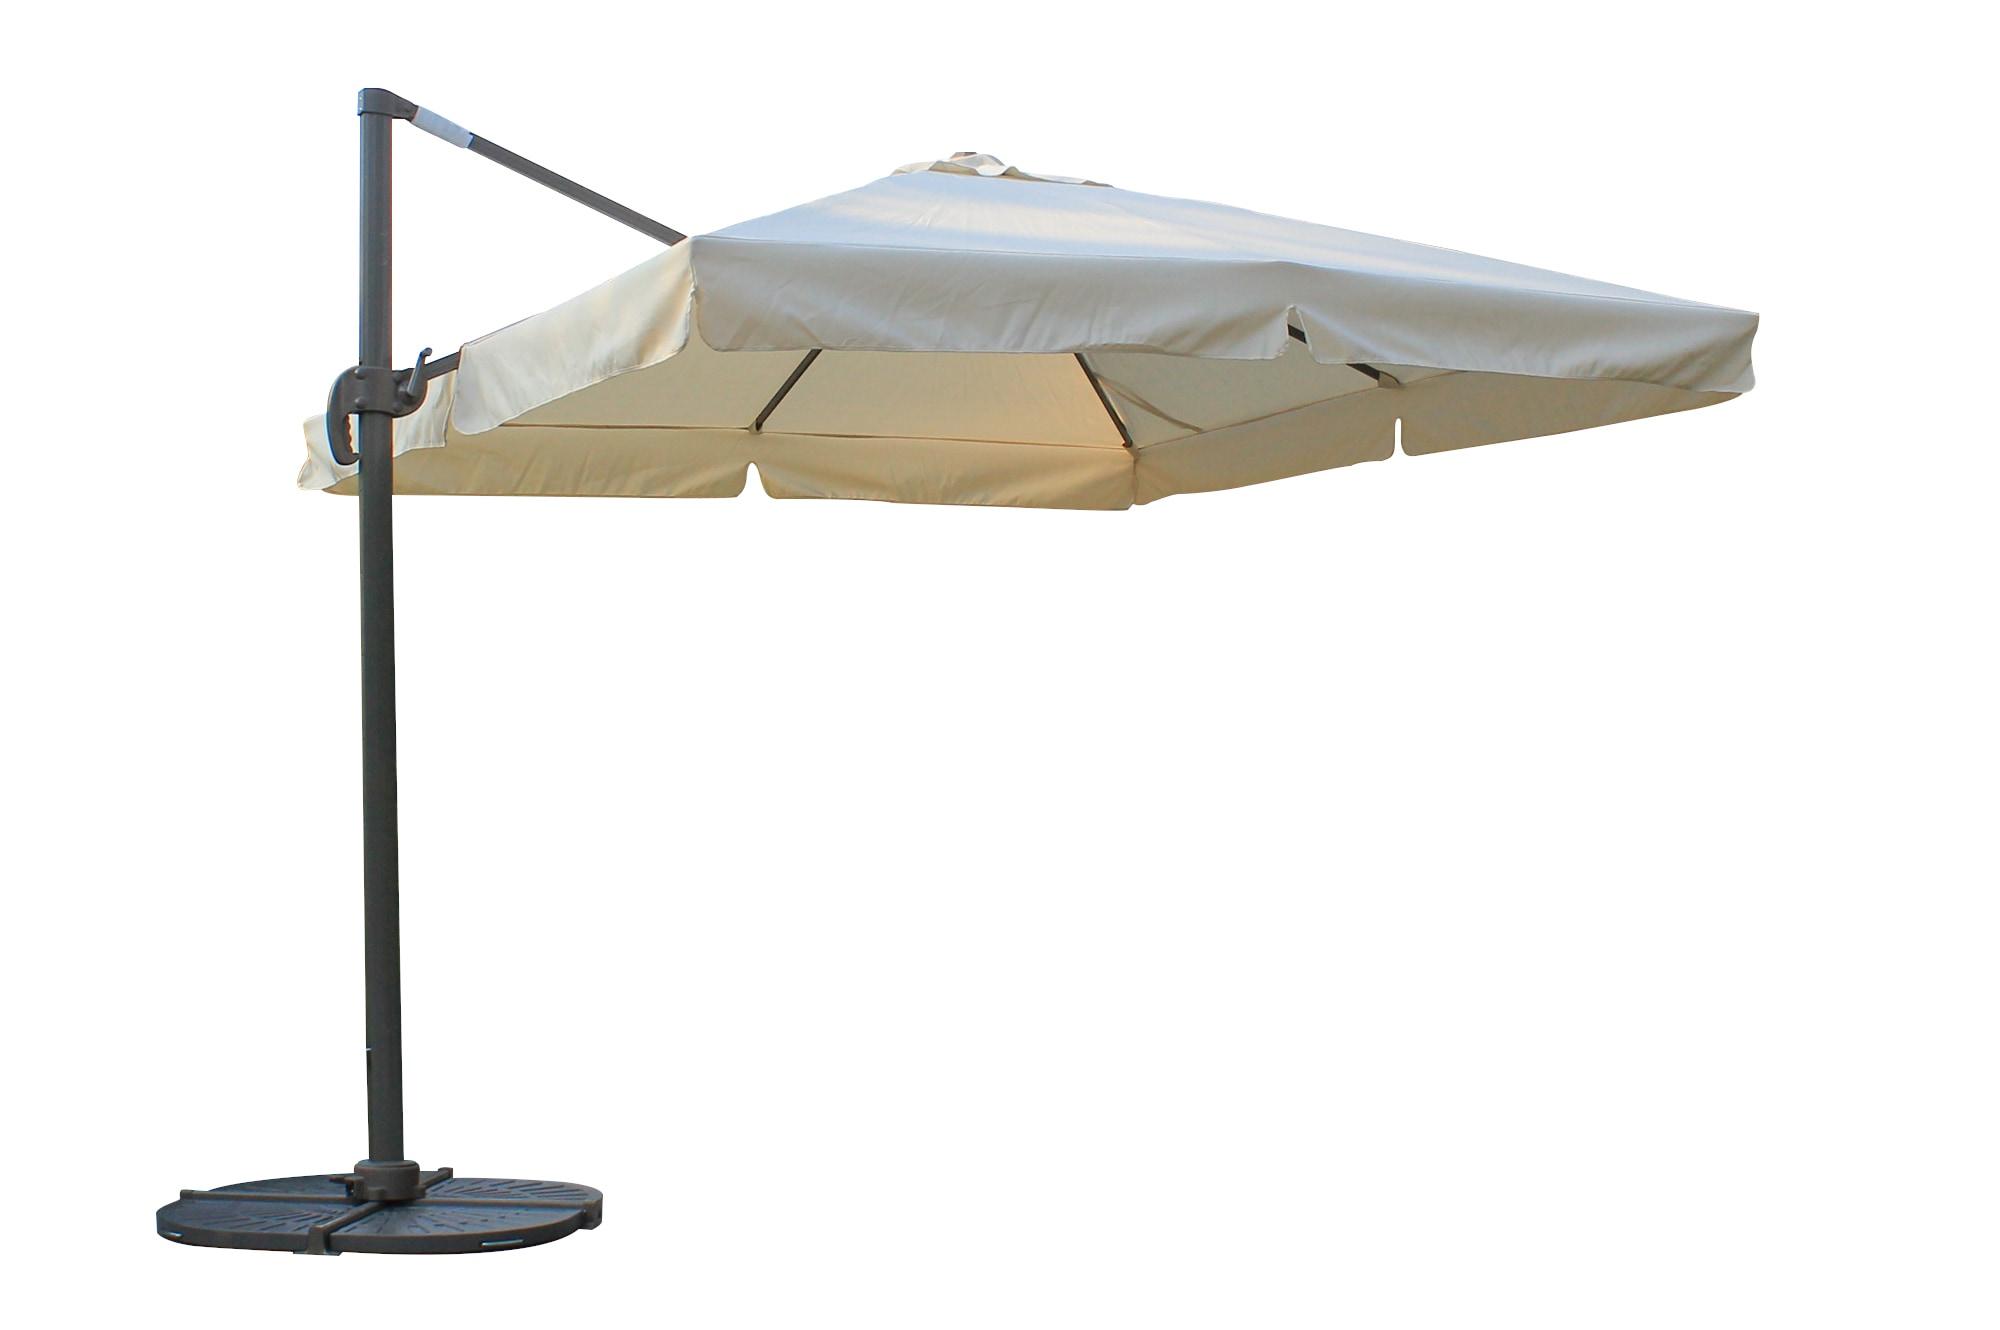 Wonderful Kontiki Shade U0026 Cooling Offset Patio Umbrellas 10 Ft Square Offset Roma  Umbrella   Taupe